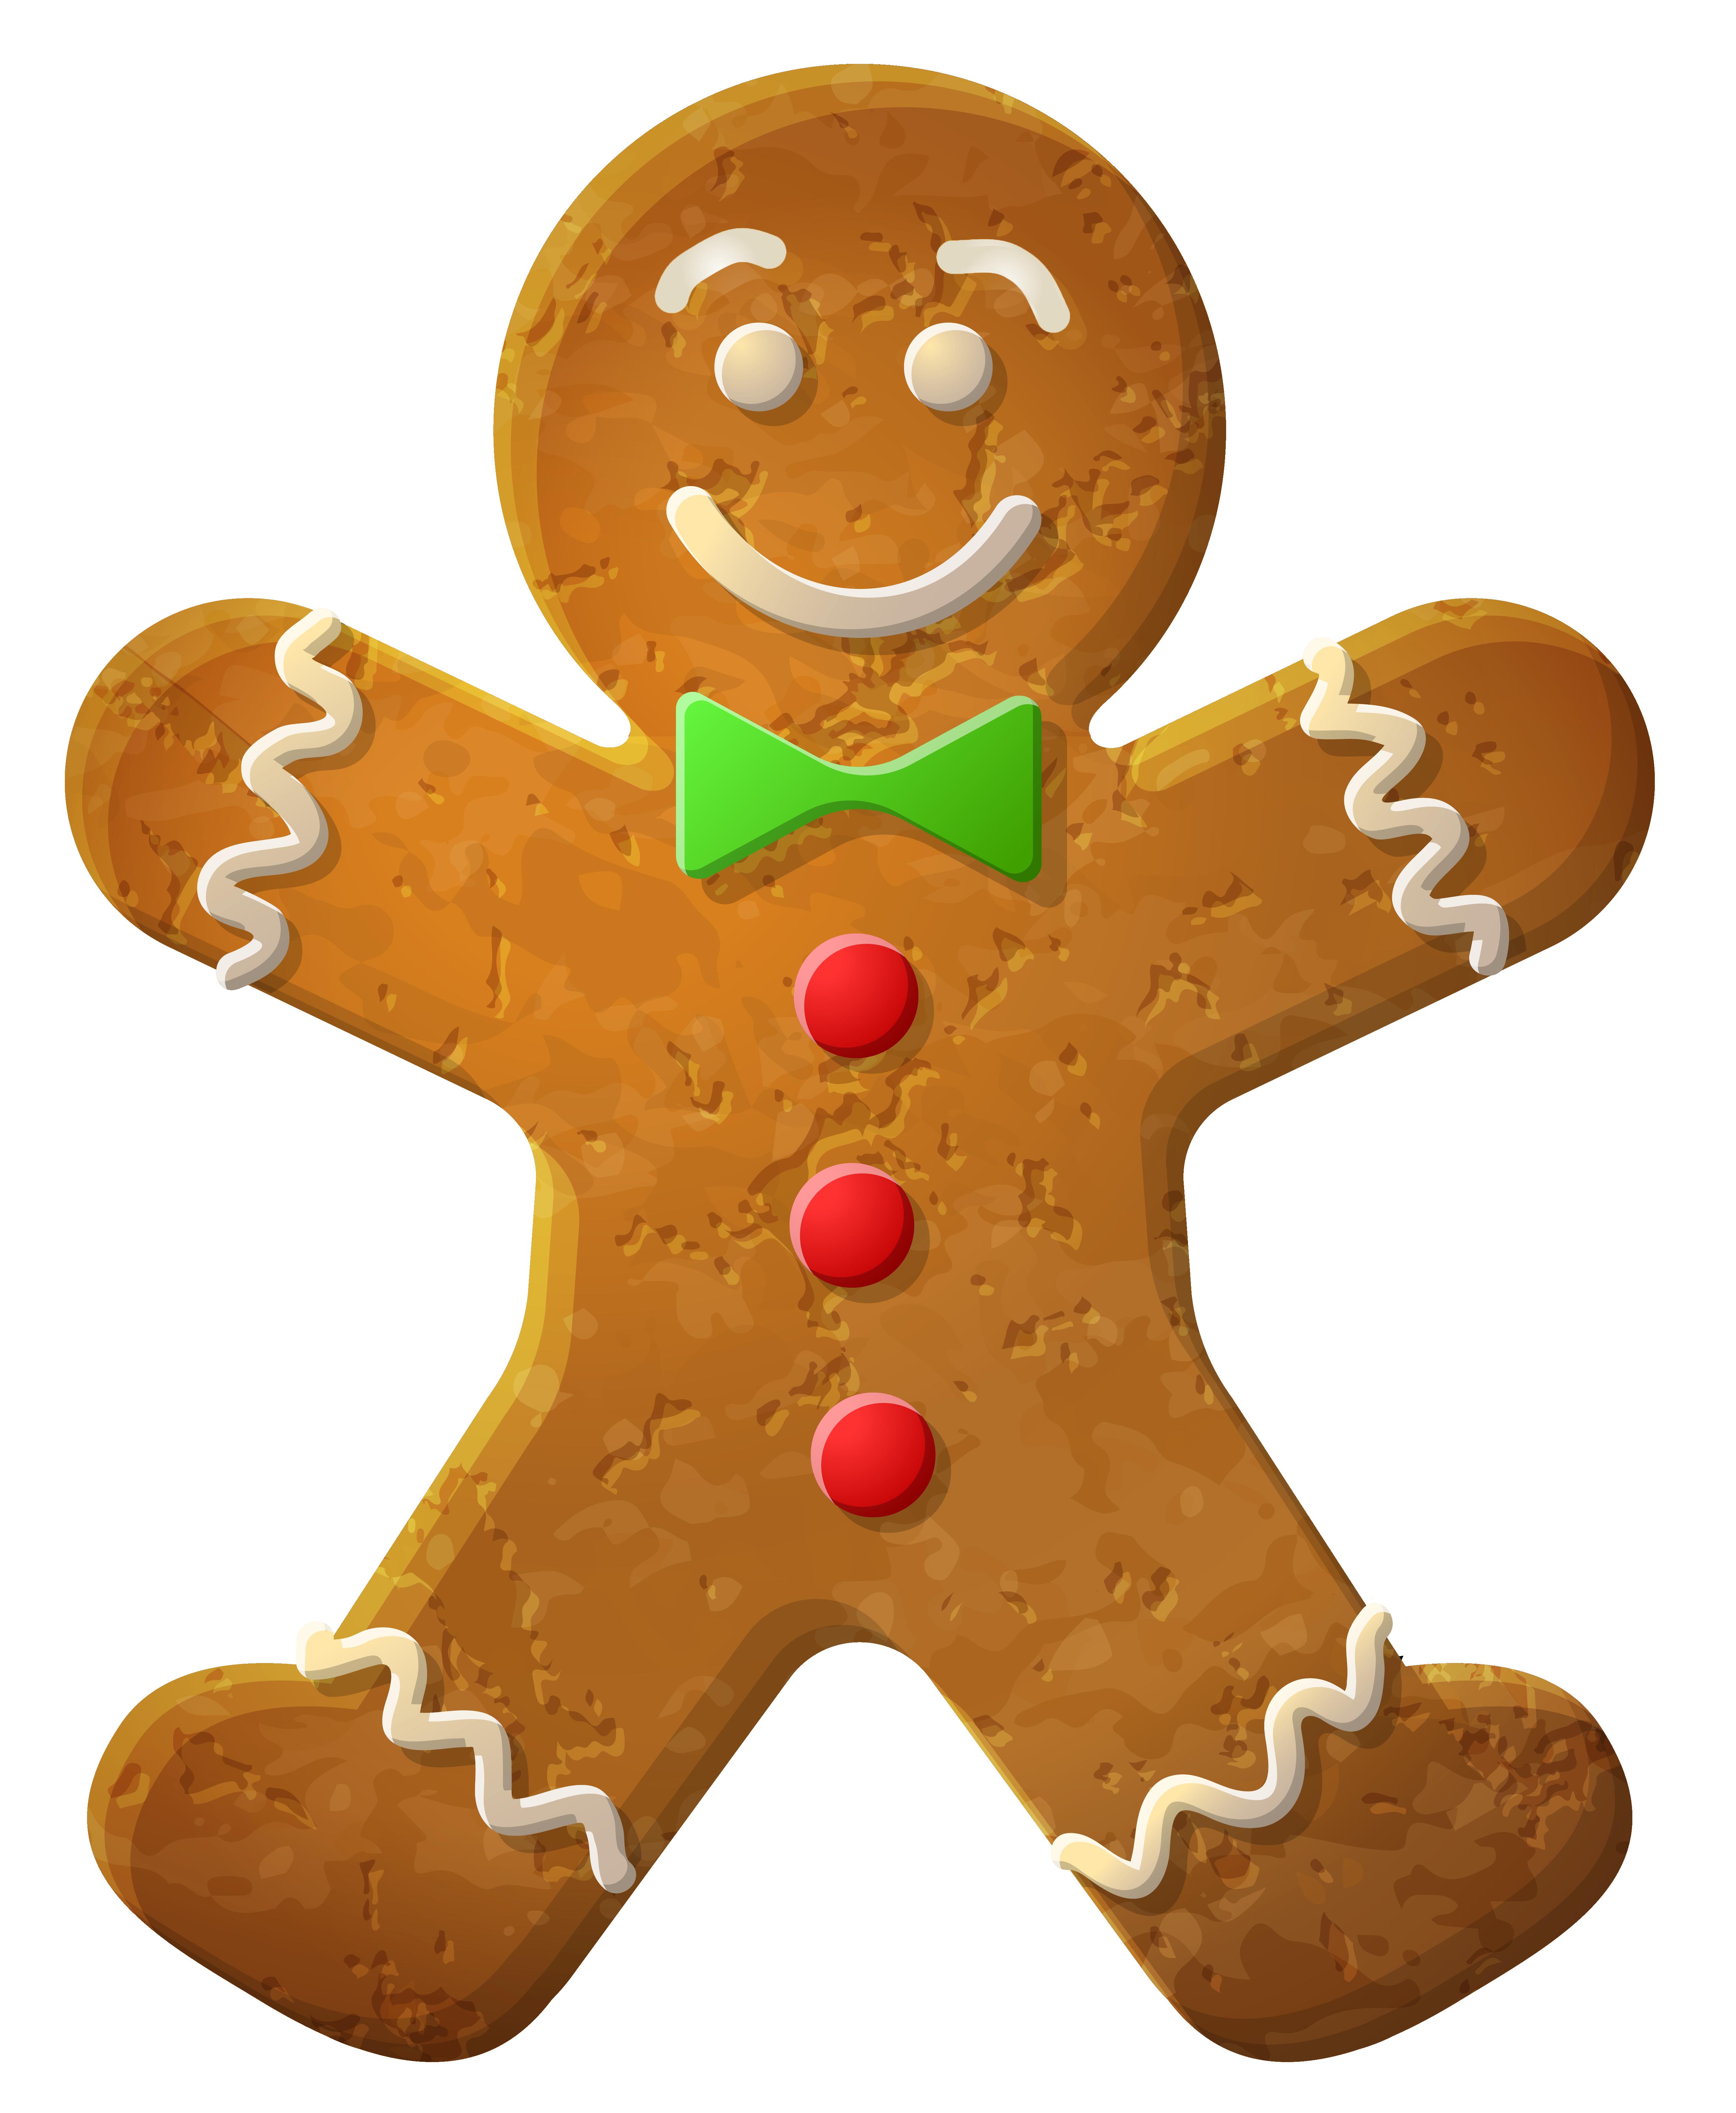 Gingerbread Man Png Gingerbread Man Decorations Gingerbread Man Homemade Christmas Decorations